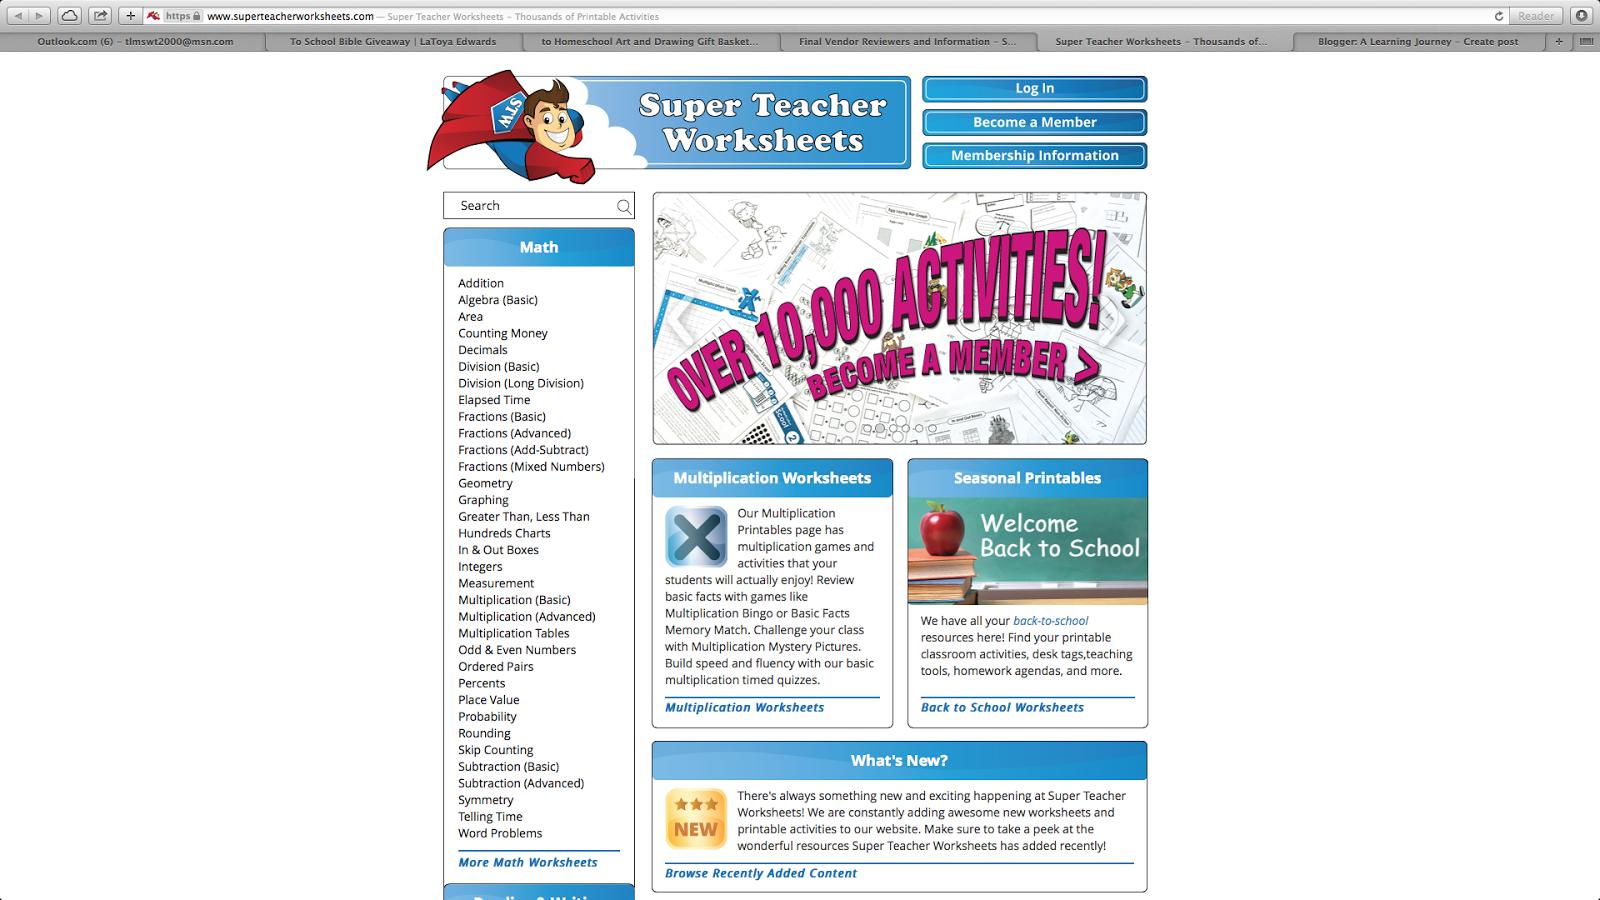 Workbooks super teacher worksheets pdf : A Learning Journey: TOS Review: Super Teacher Worksheets